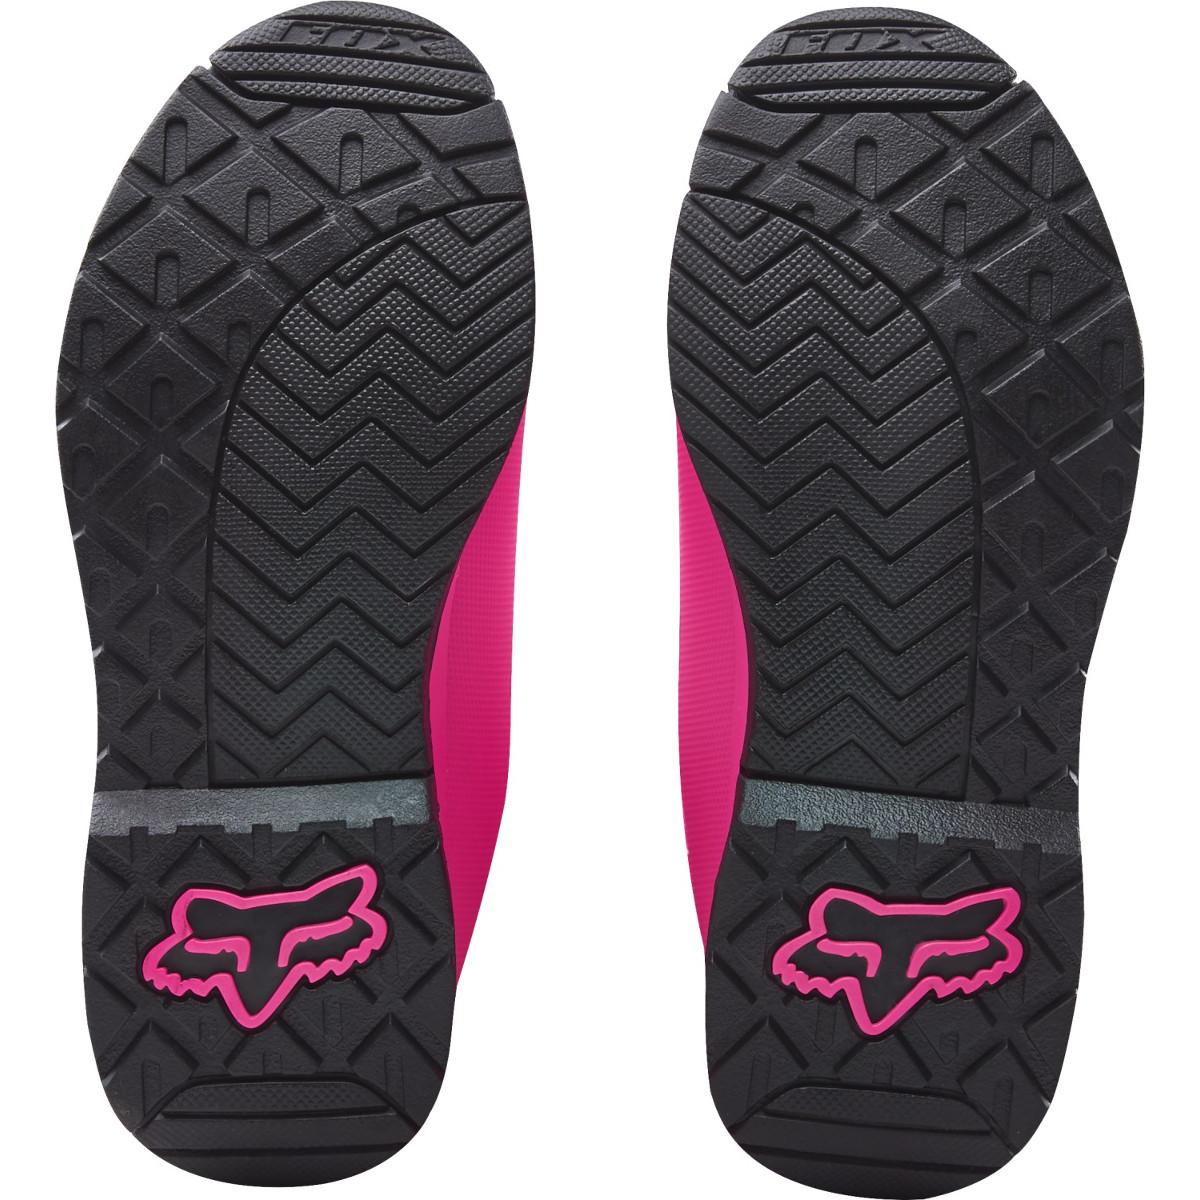 Fox Girls Motocross Stiefel Comp 5 SchwarzPink